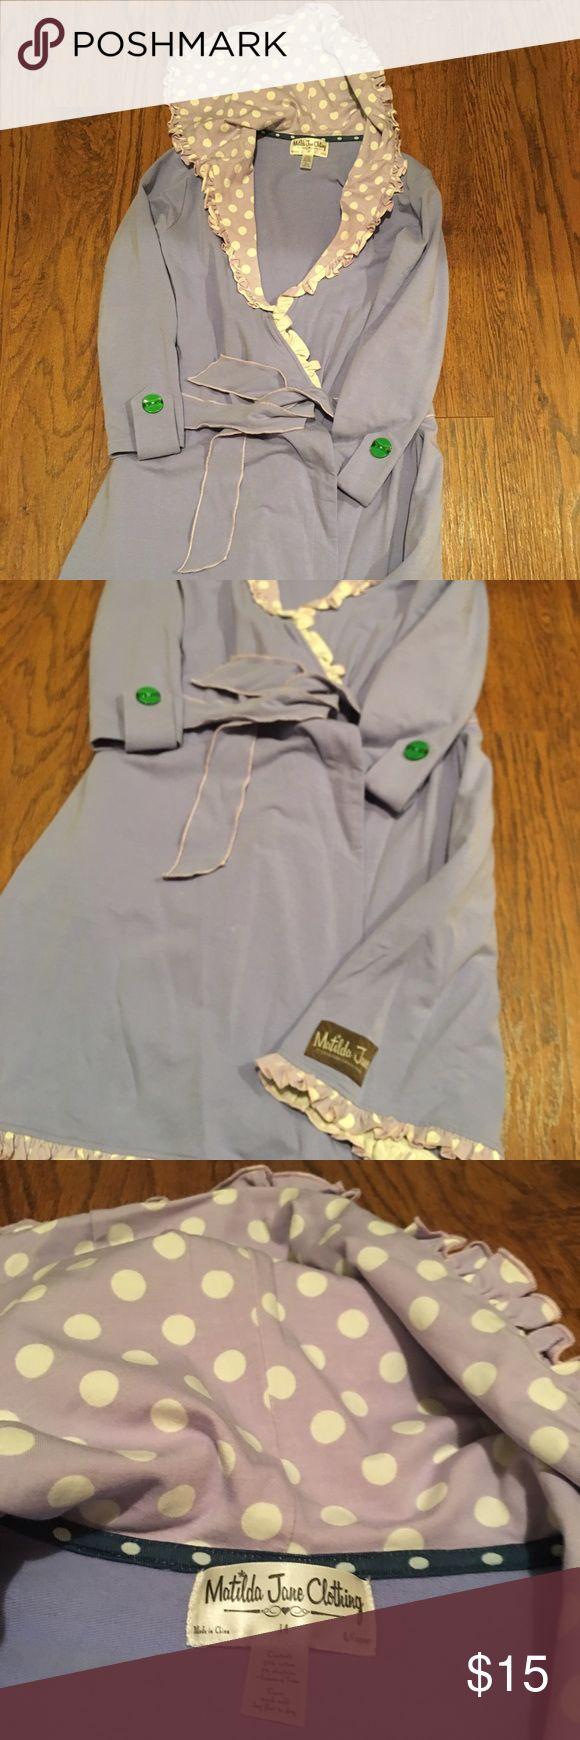 Matilda Jane Jacket Matilda Jane wrap jacket with tie belt. Lavender in color Matilda Jane Jackets & Coats